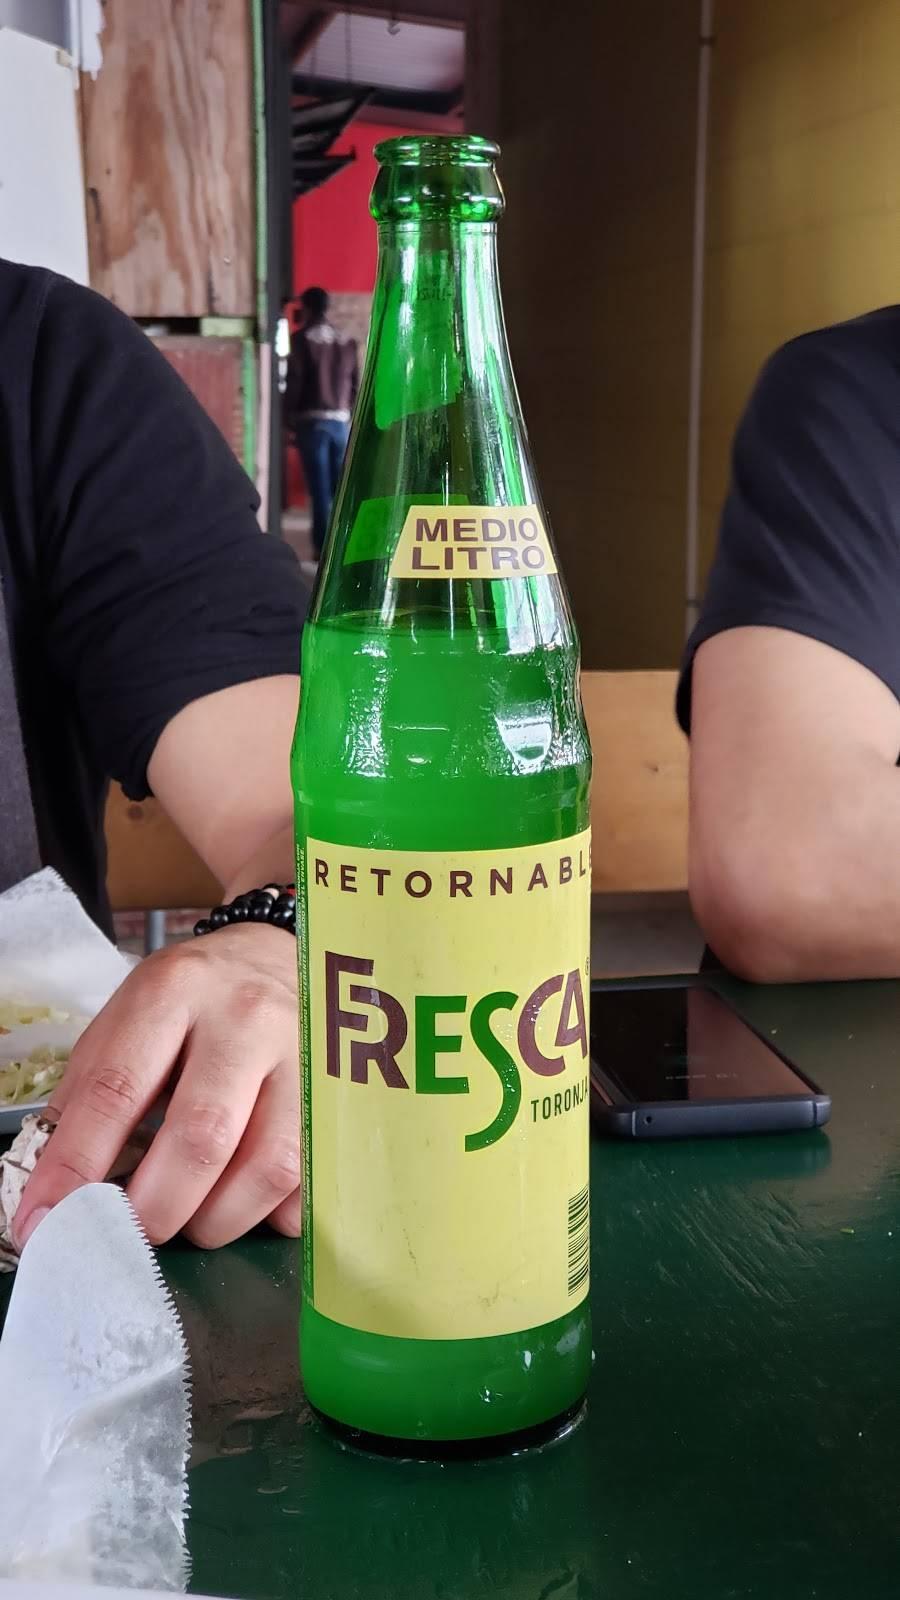 Terraza Tropical Sports Bar | restaurant | 8720 Airline Dr, Houston, TX 77037, USA | 7138753373 OR +1 713-875-3373